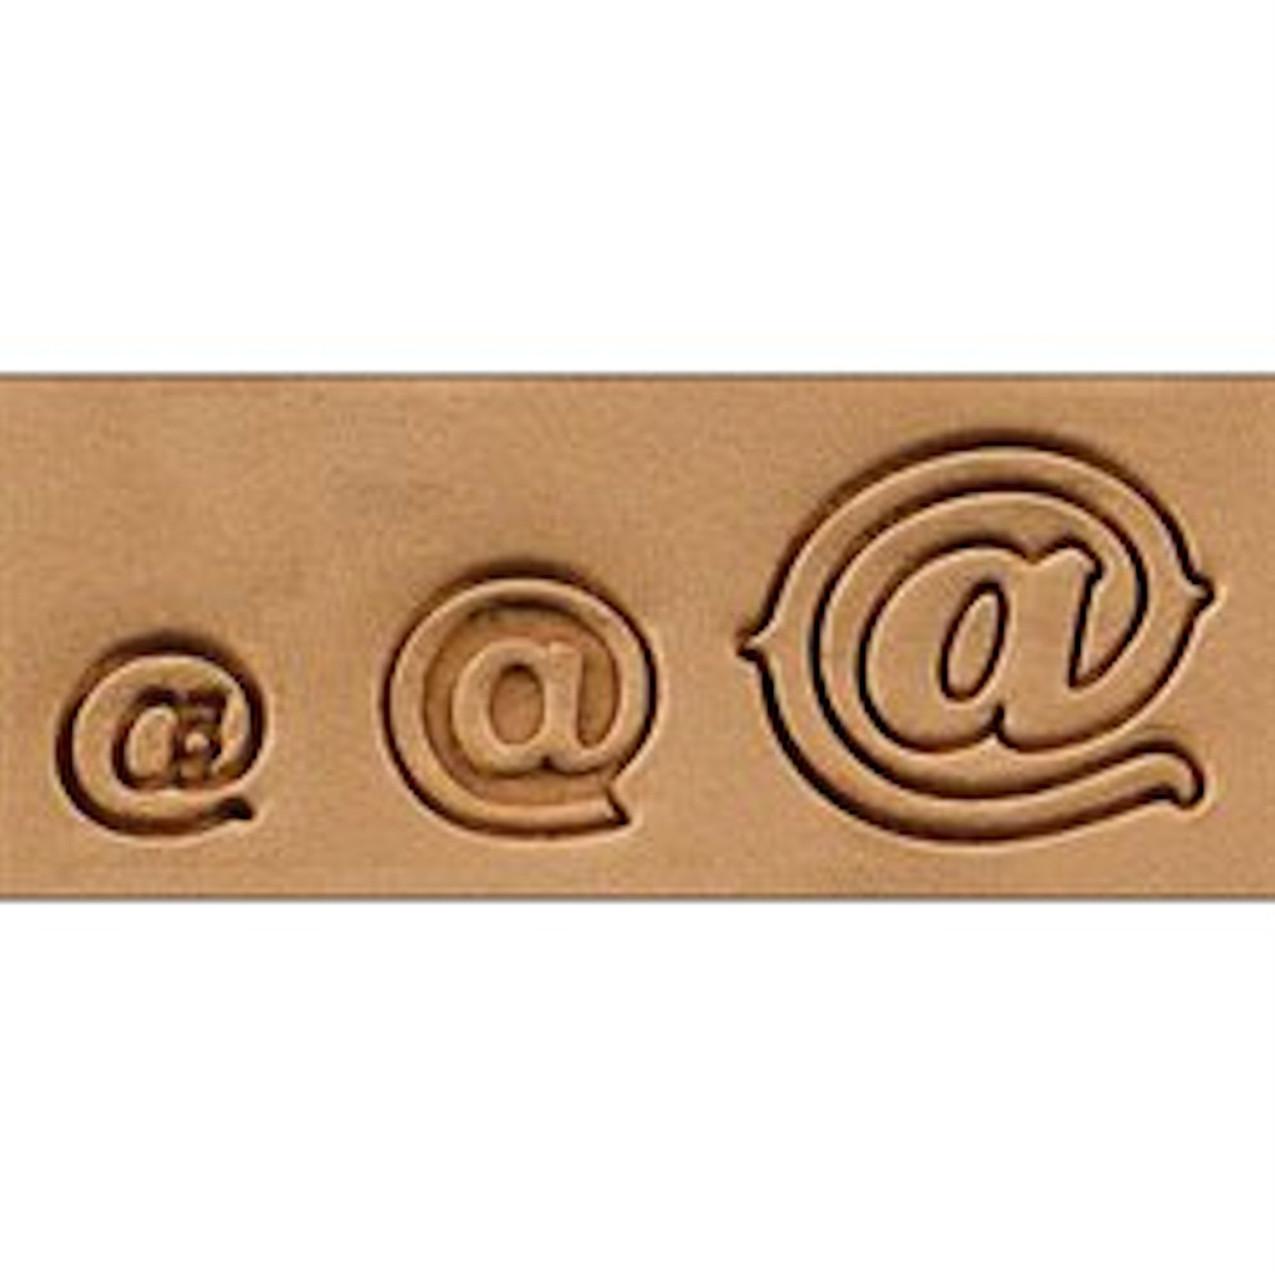 Craftool @ Stamp Set Asstd Sizes